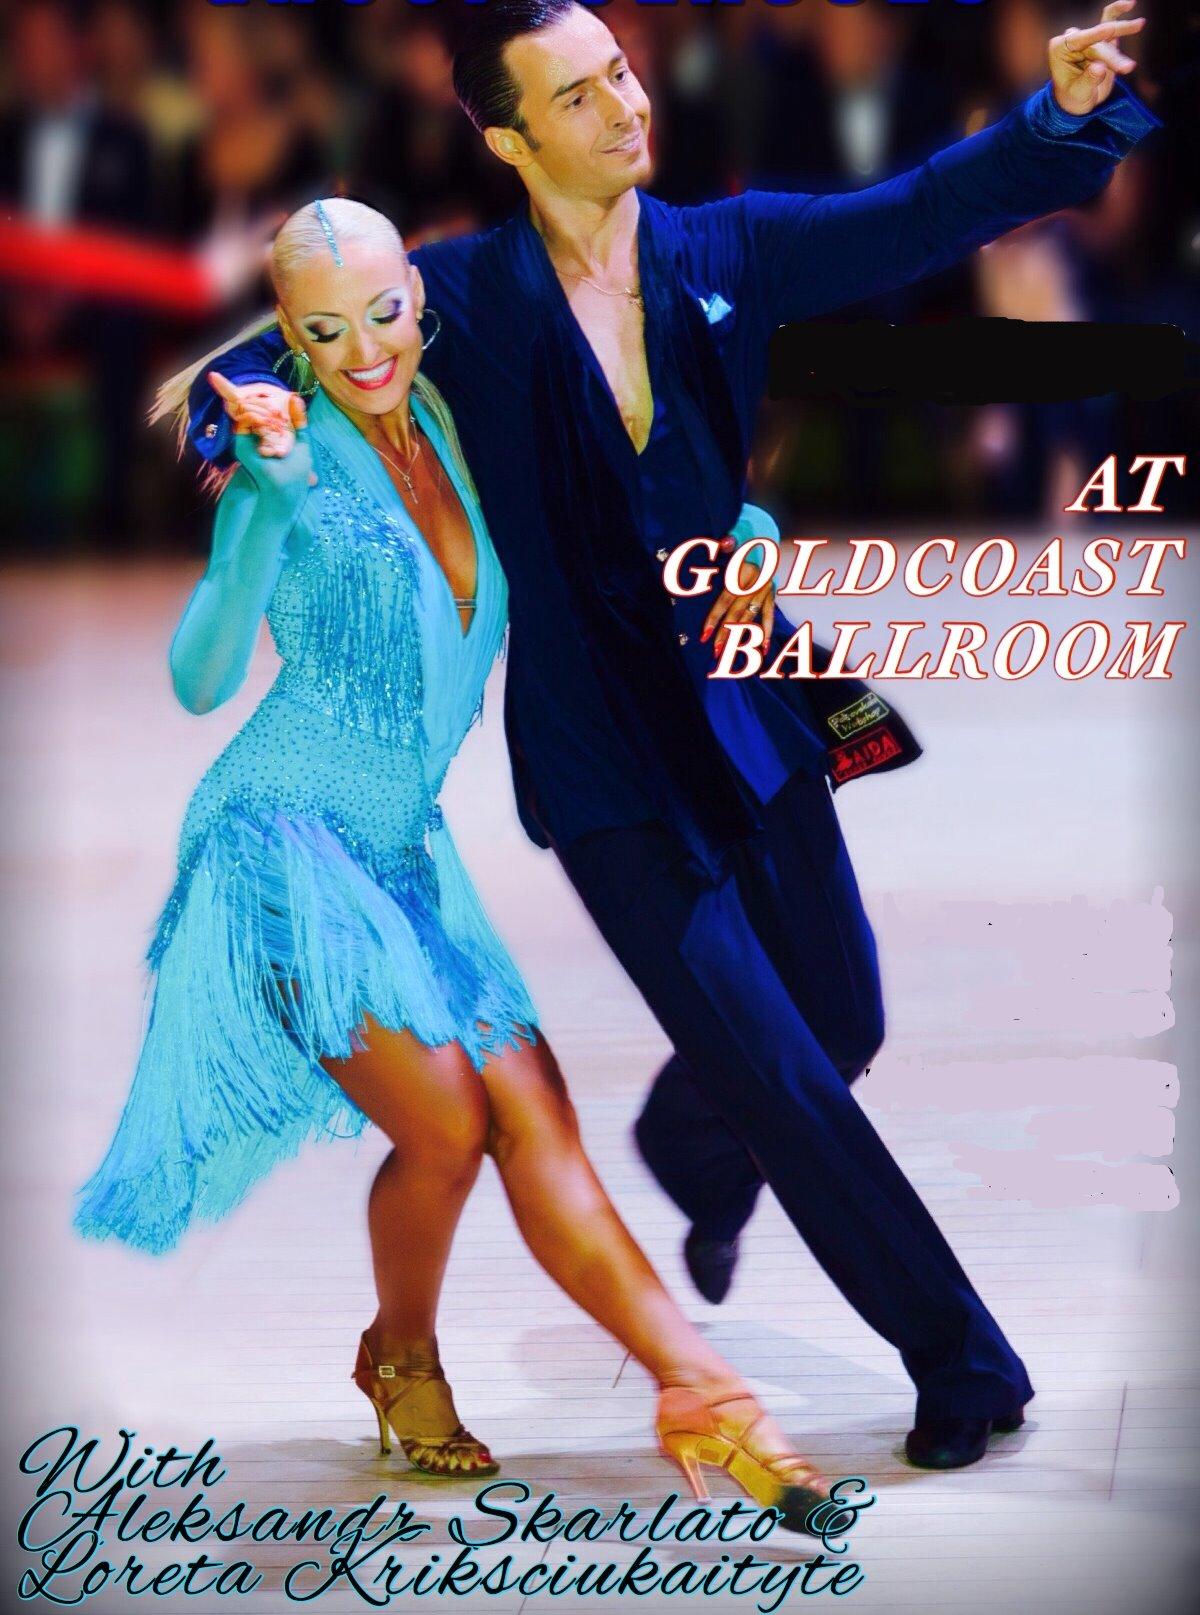 Aleksandr Skarlato & Loreta Kriksciukaityte - International Latin Champions.  Aleksandr teaches International Latin Classes Monday Evenings at Goldcoast Ballroom!!